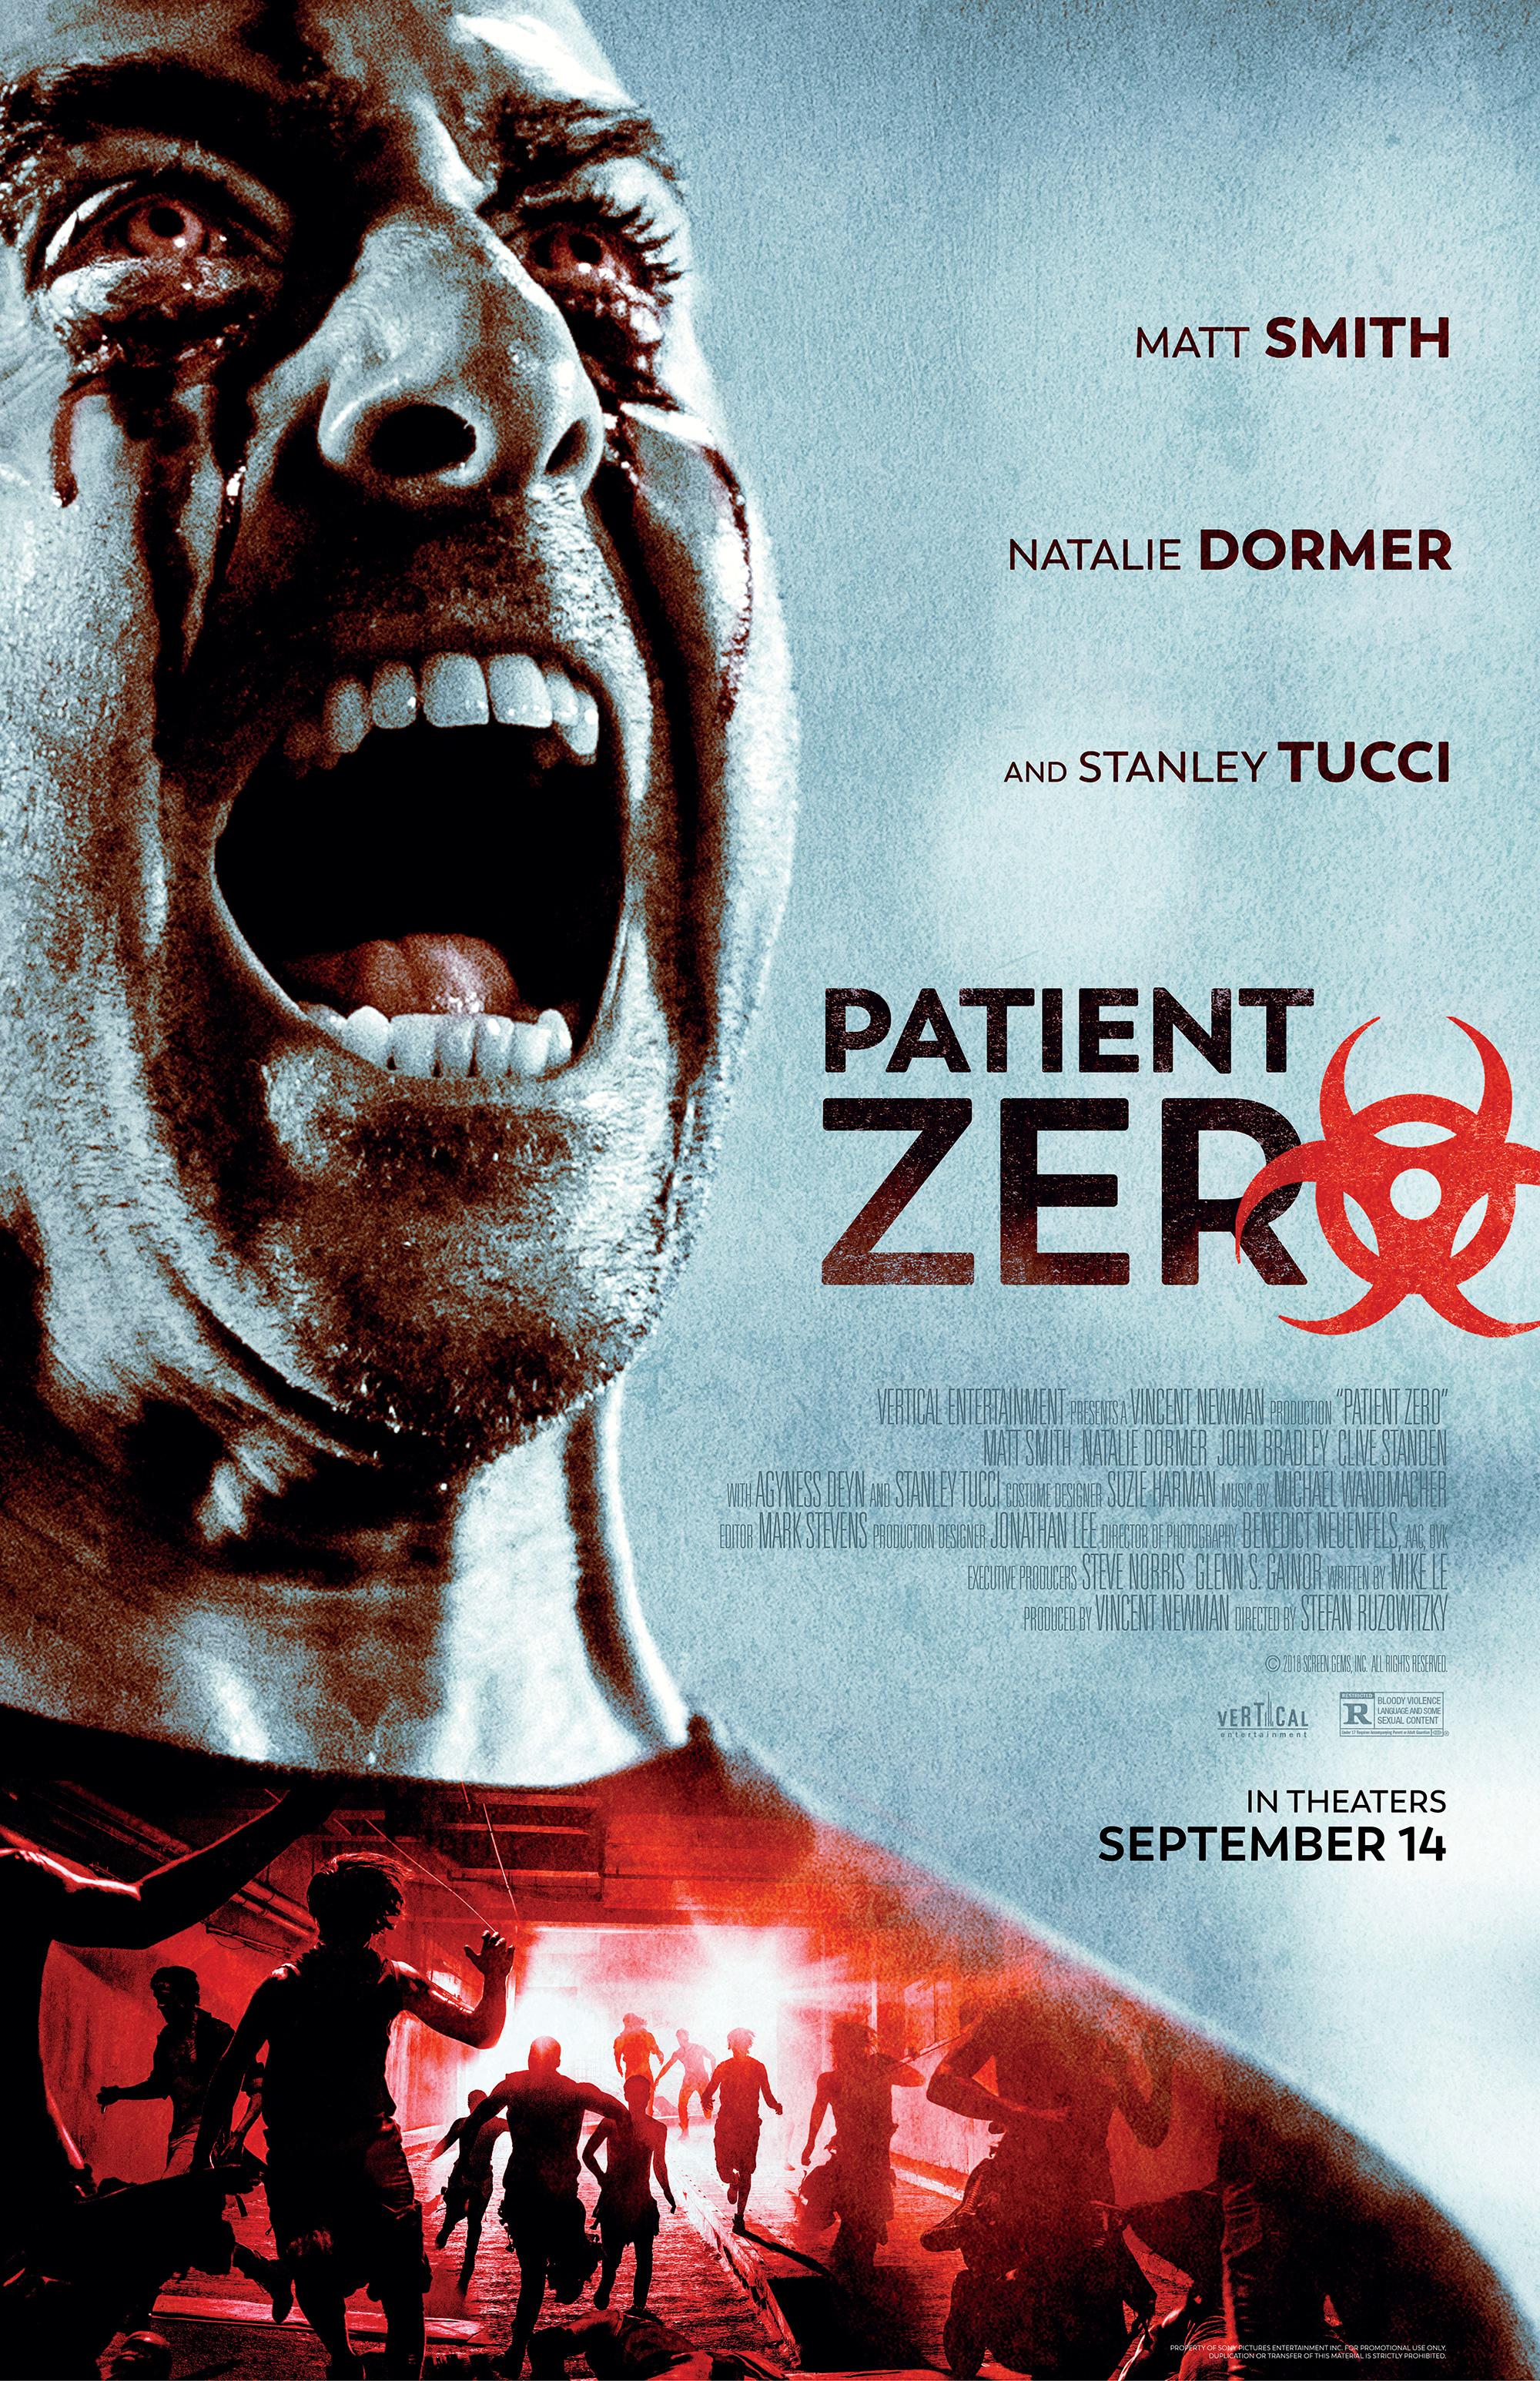 2013 BloodList script PATIENT ZERO by Mike Le gets a poster and release date! #BloodListAlum